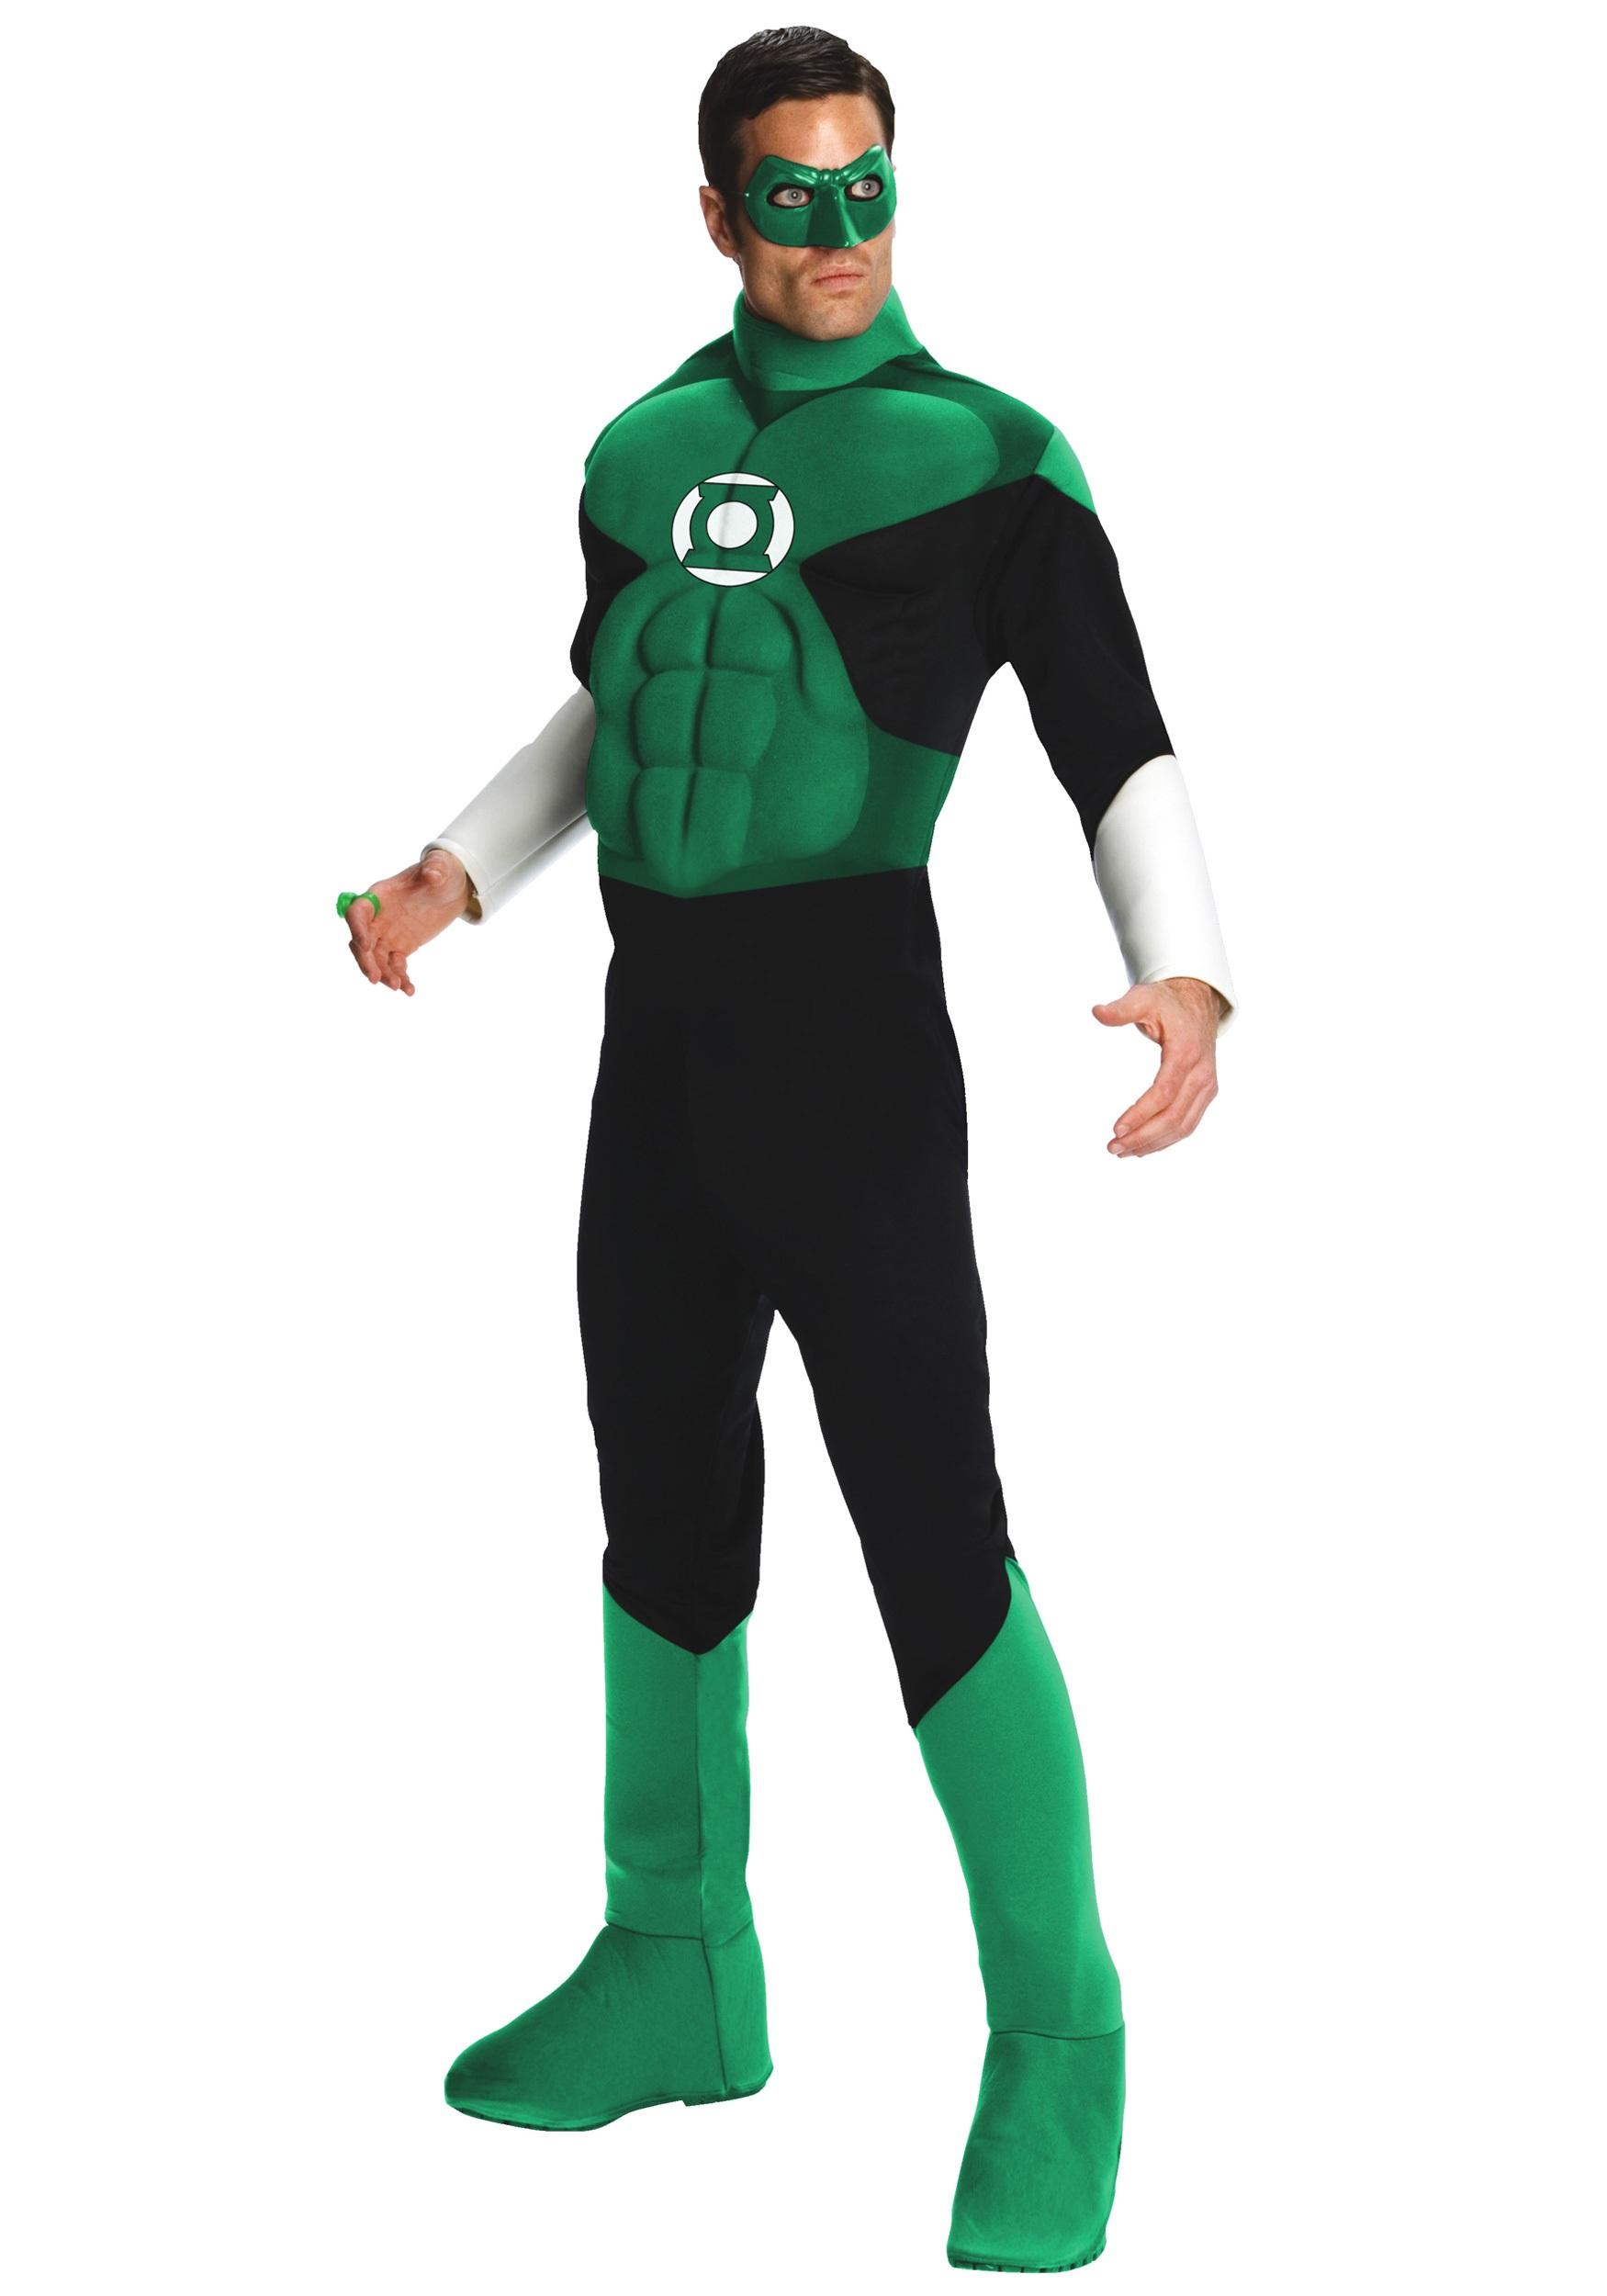 Green Lantern Deluxe Costume